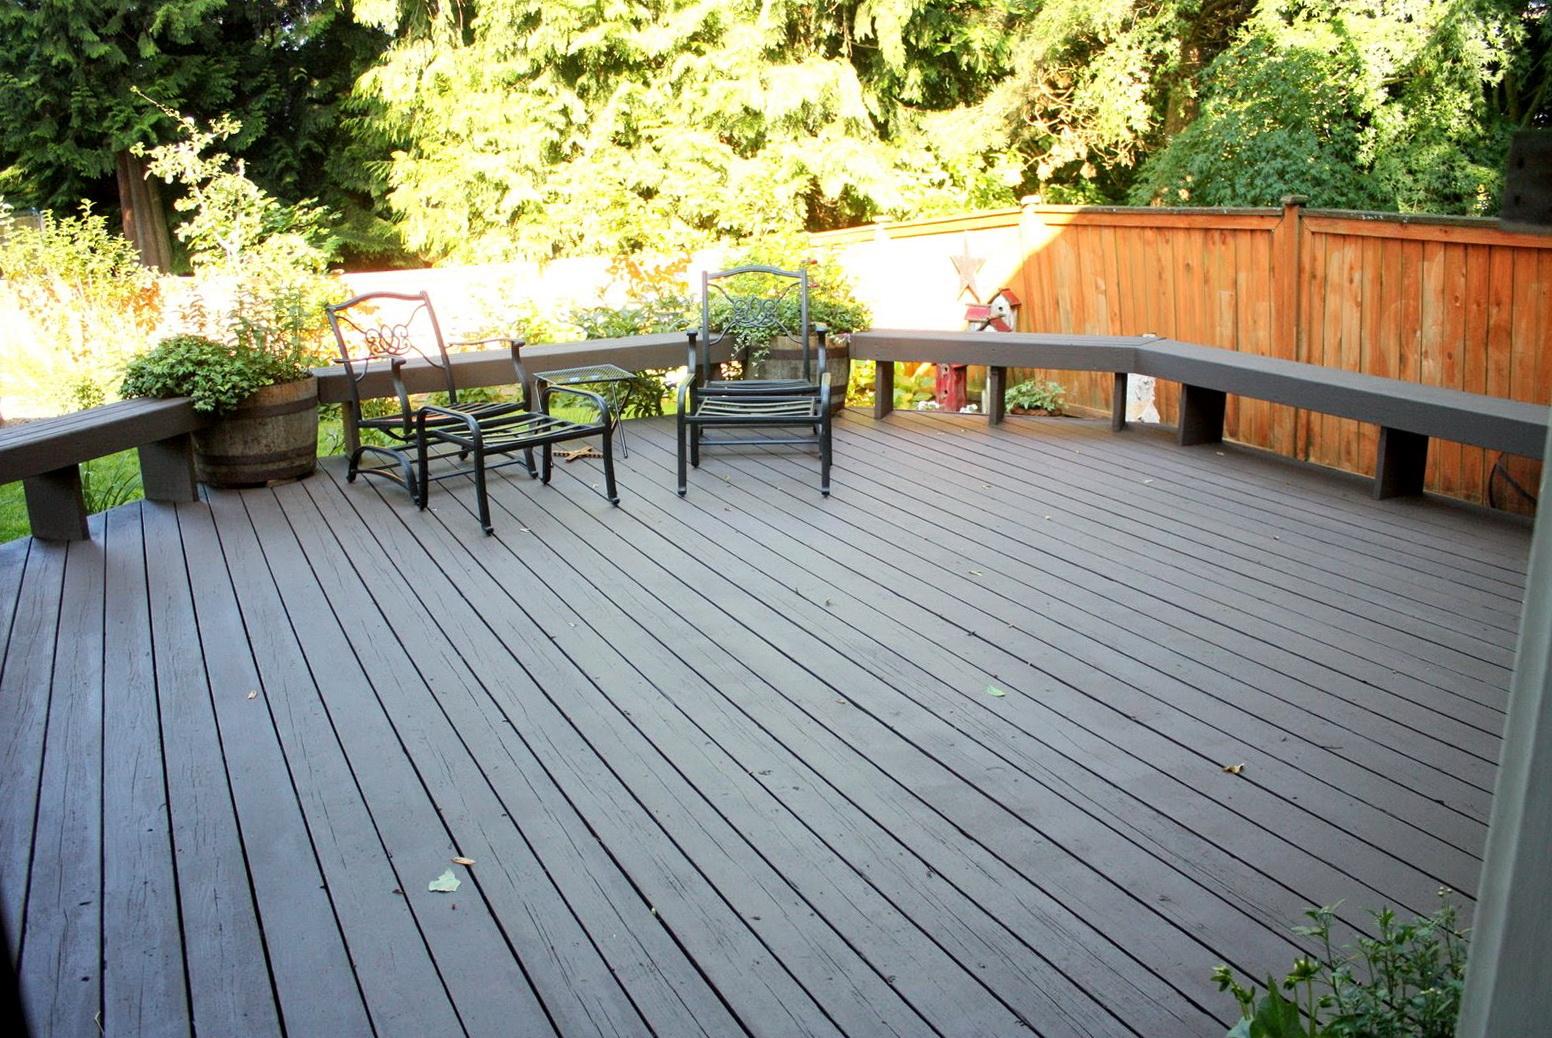 Behr Deck Over Slate Gray